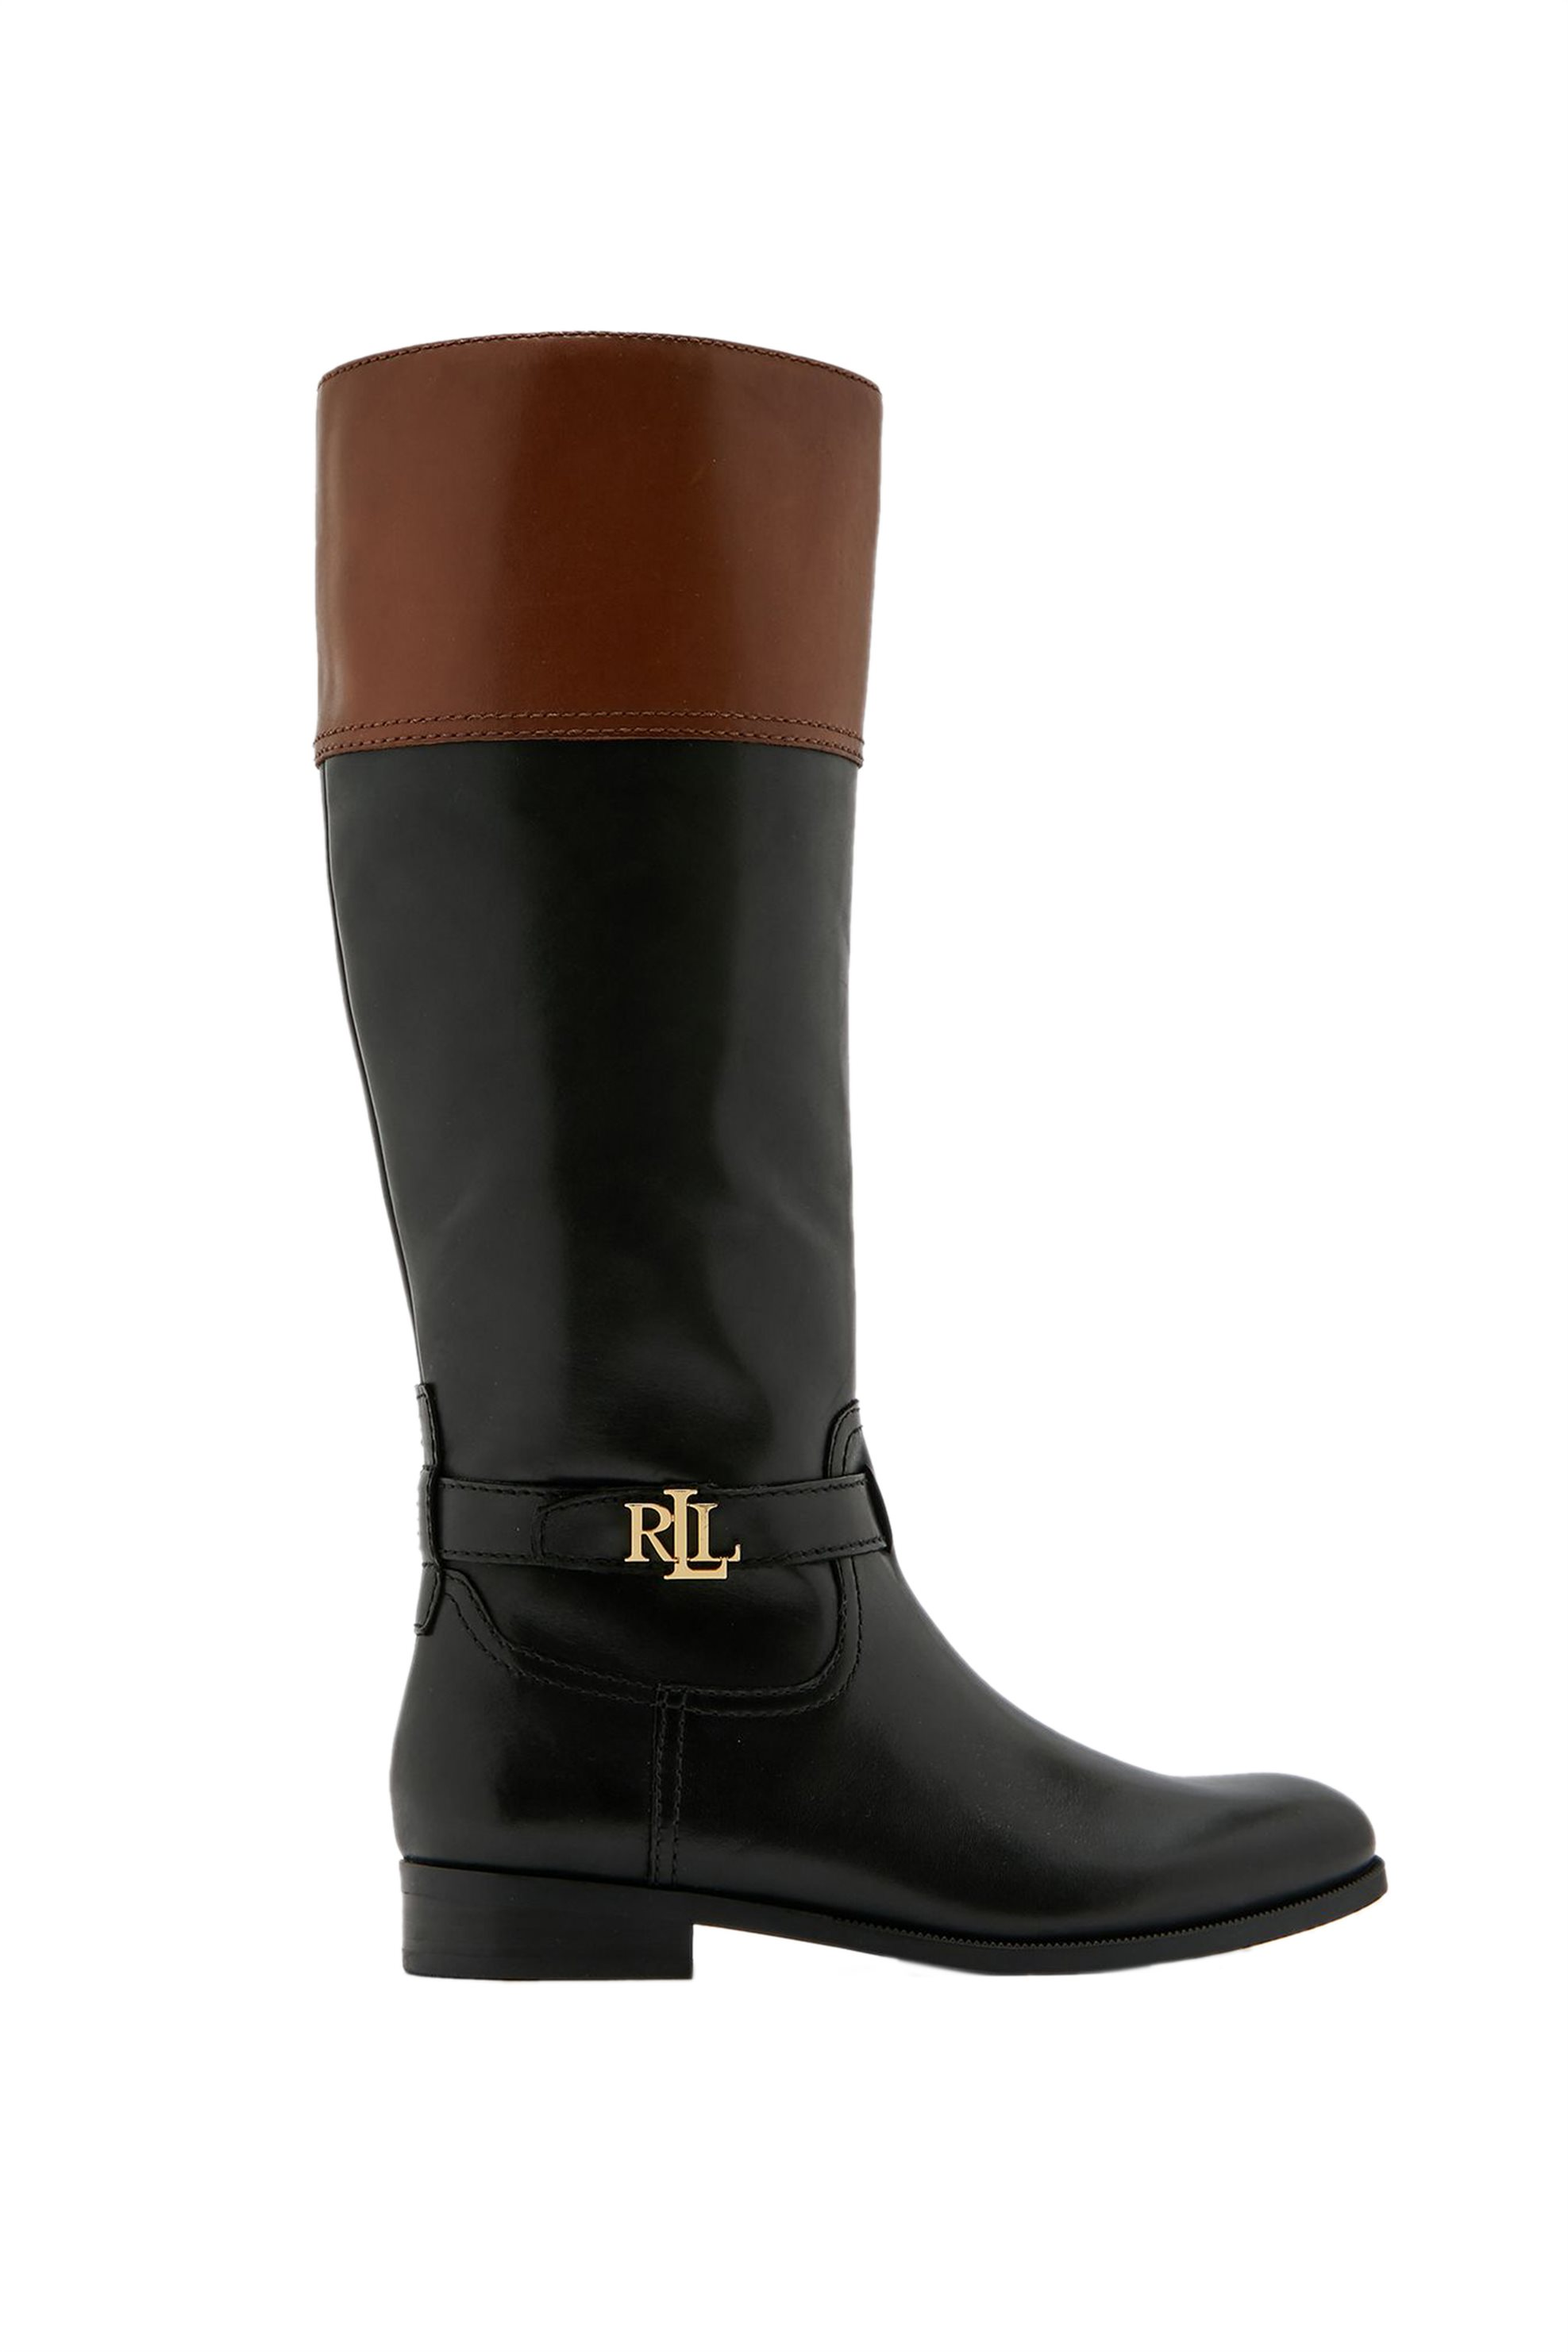 "Lauren Ralph Lauren γυναικείες δερμάτινες μπότες με μεταλλικό λογότυπο ""Baylee"" – 802797082003 – Μαύρο"